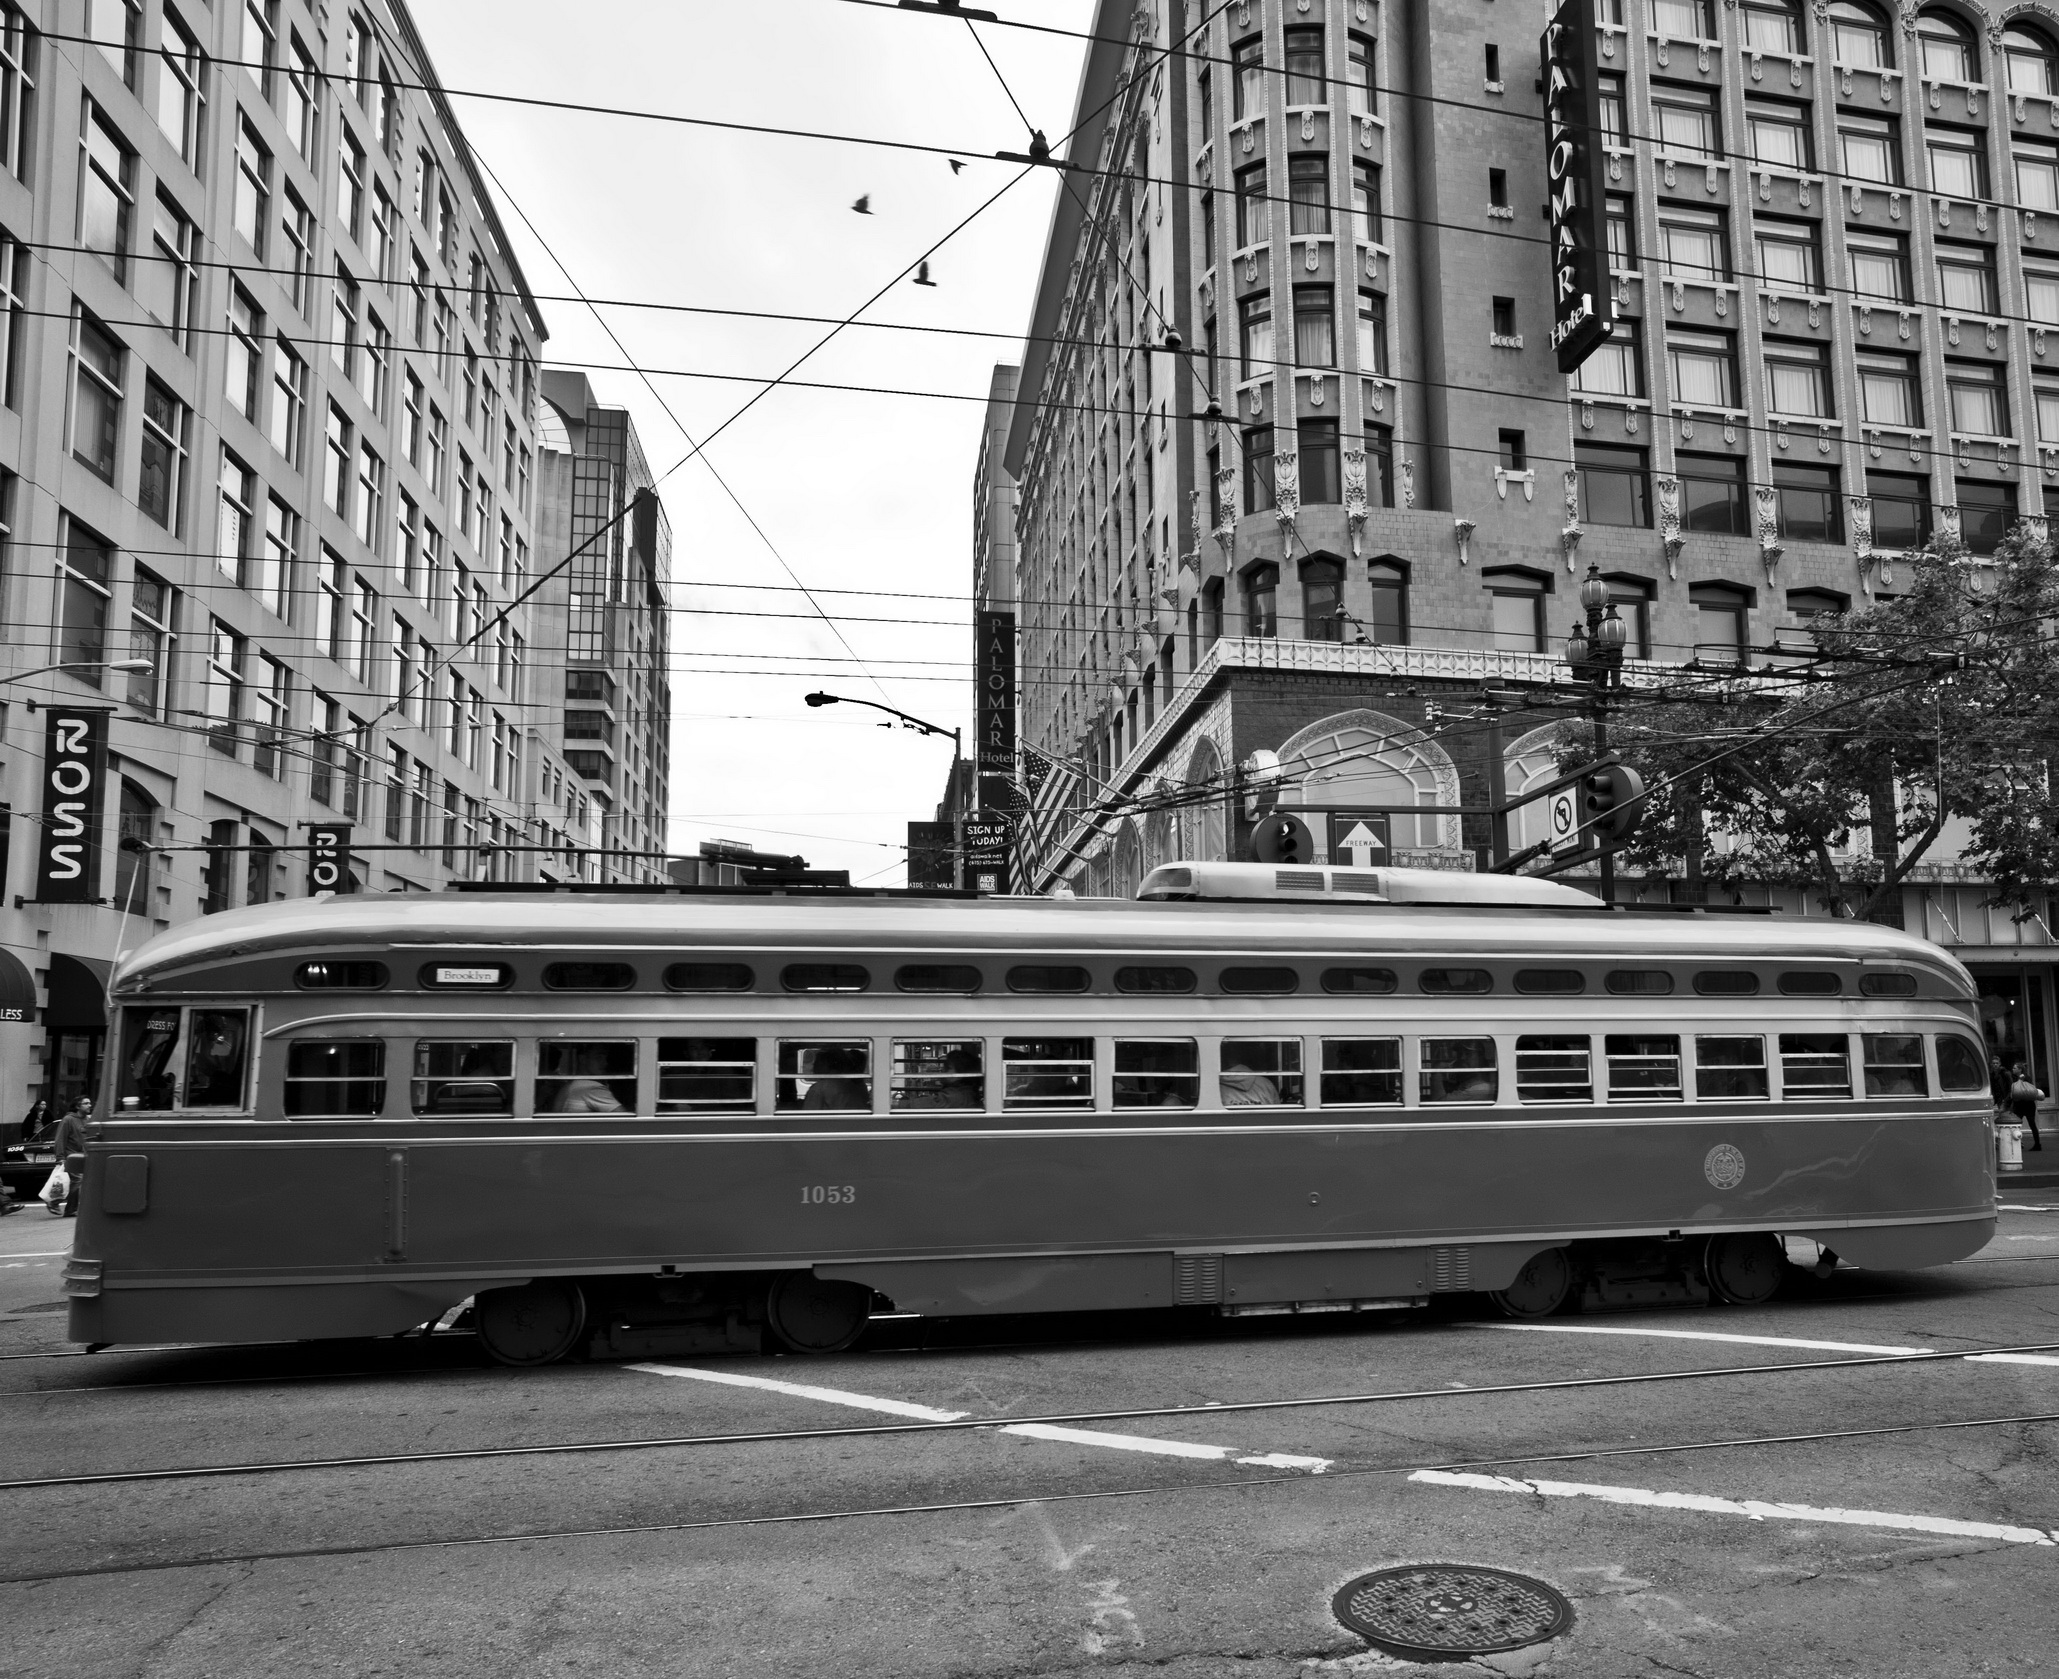 San Francisco Municipal Railway fleet PCC street car fleet cable car no 1053 10